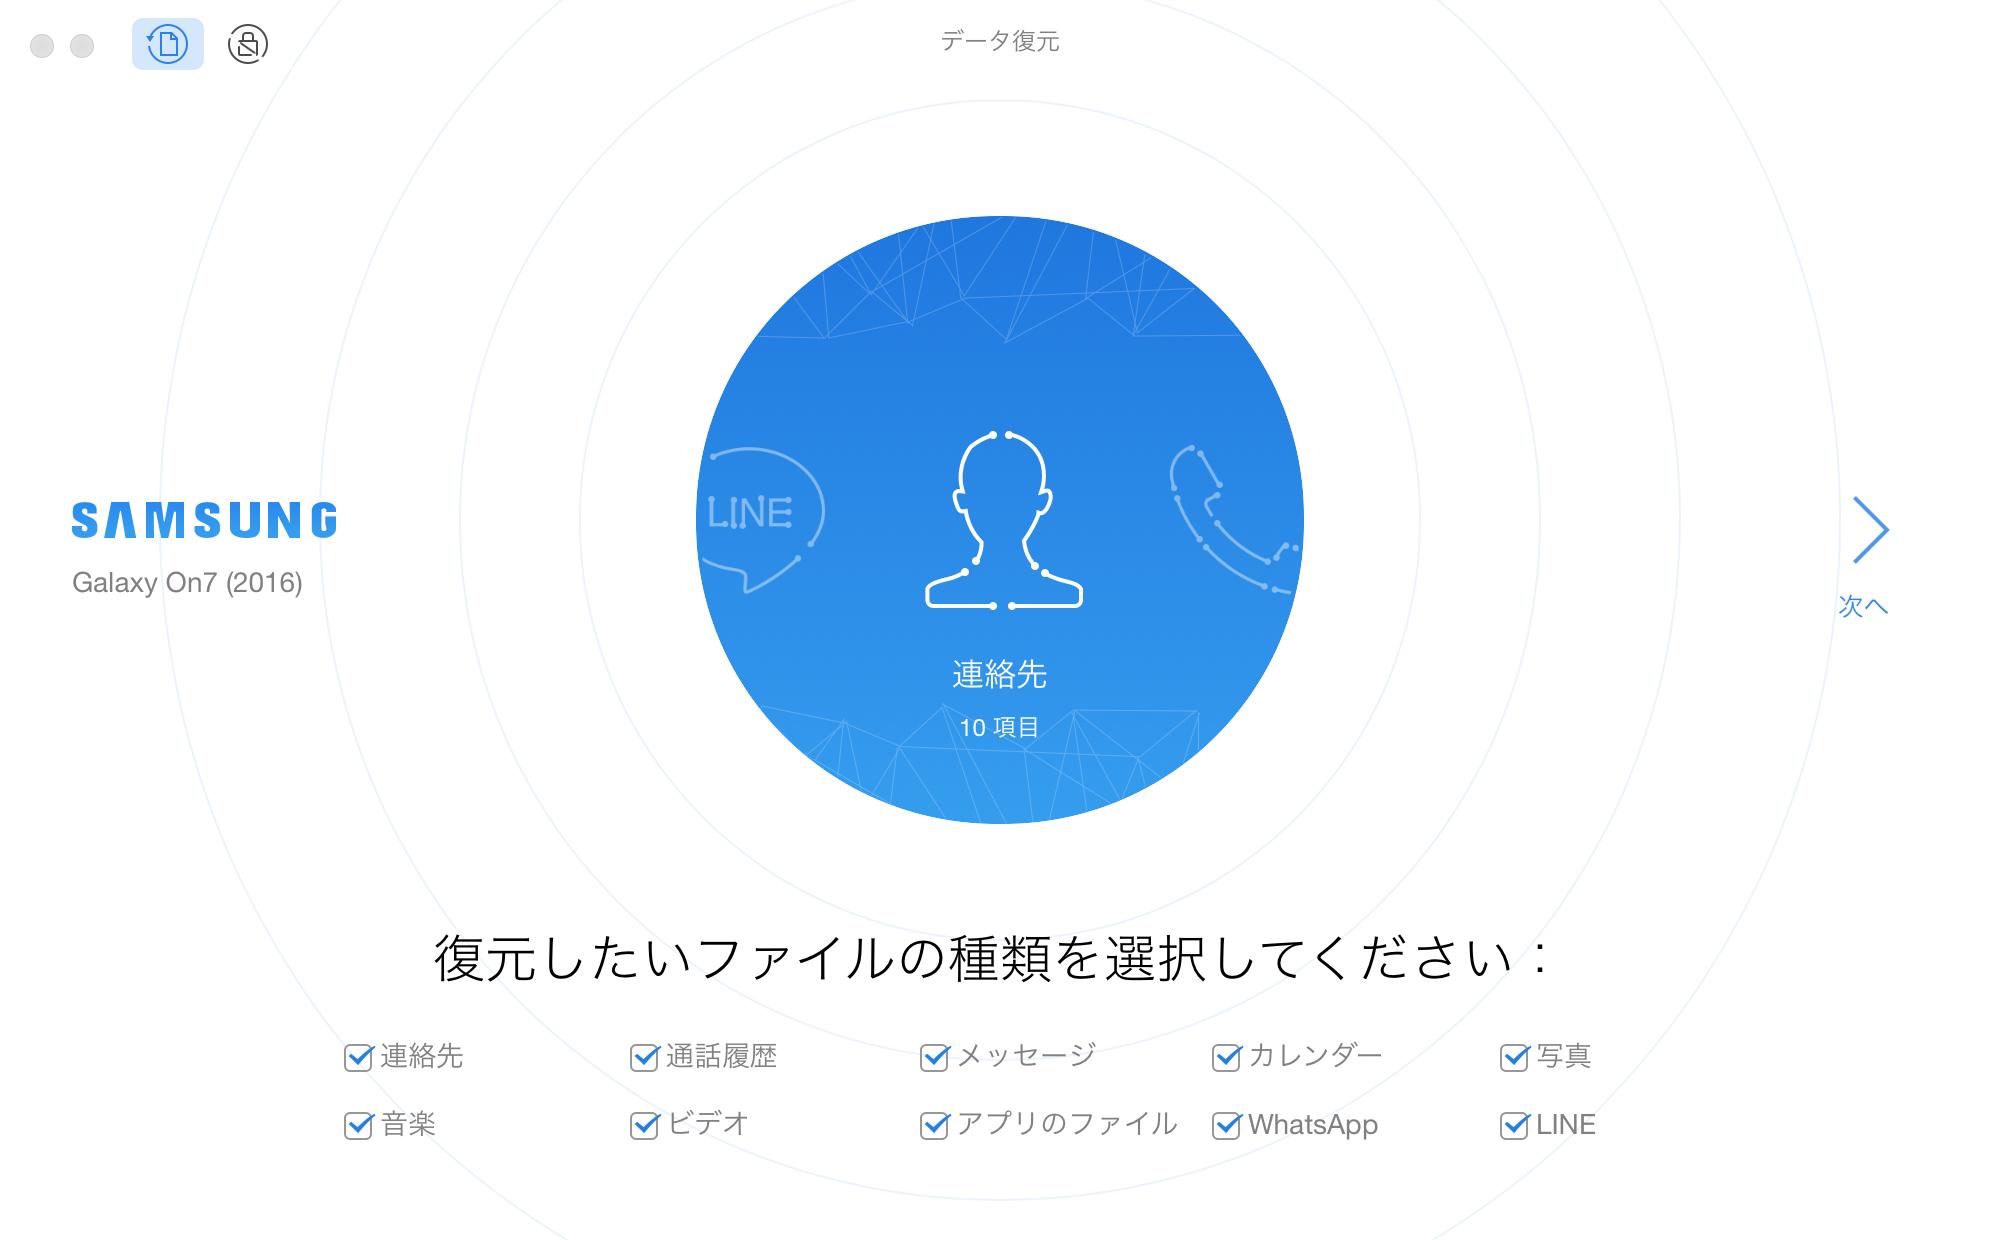 PhoneRescue - SAMSUNGデータ復元のメインインターフェイス